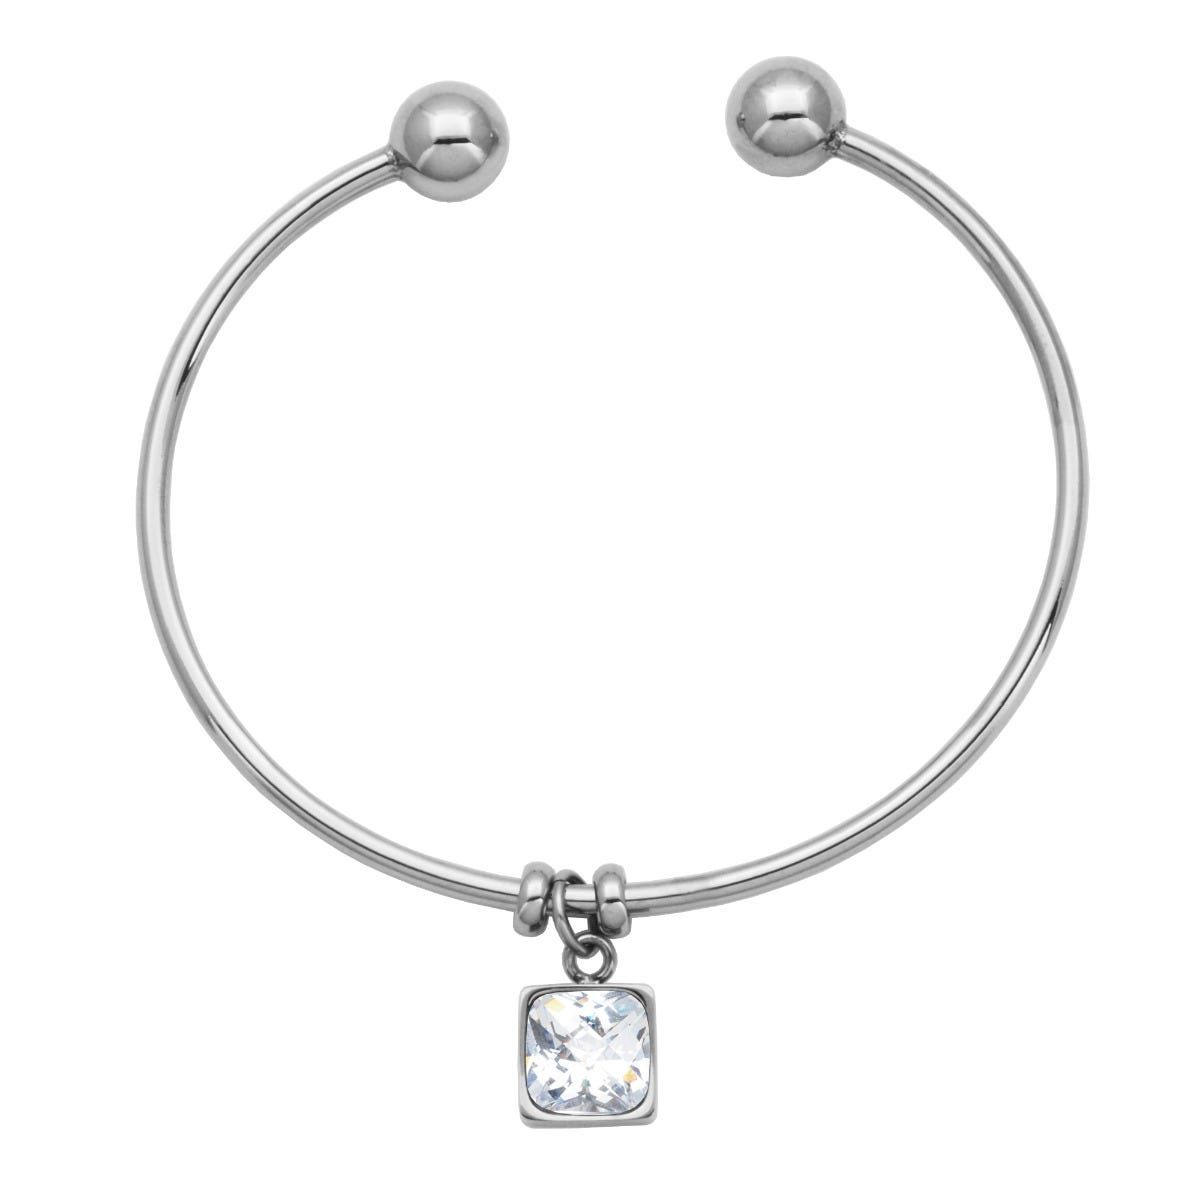 White Crystal Cushion-Cut Flexible Cuff Bangle Bracelet